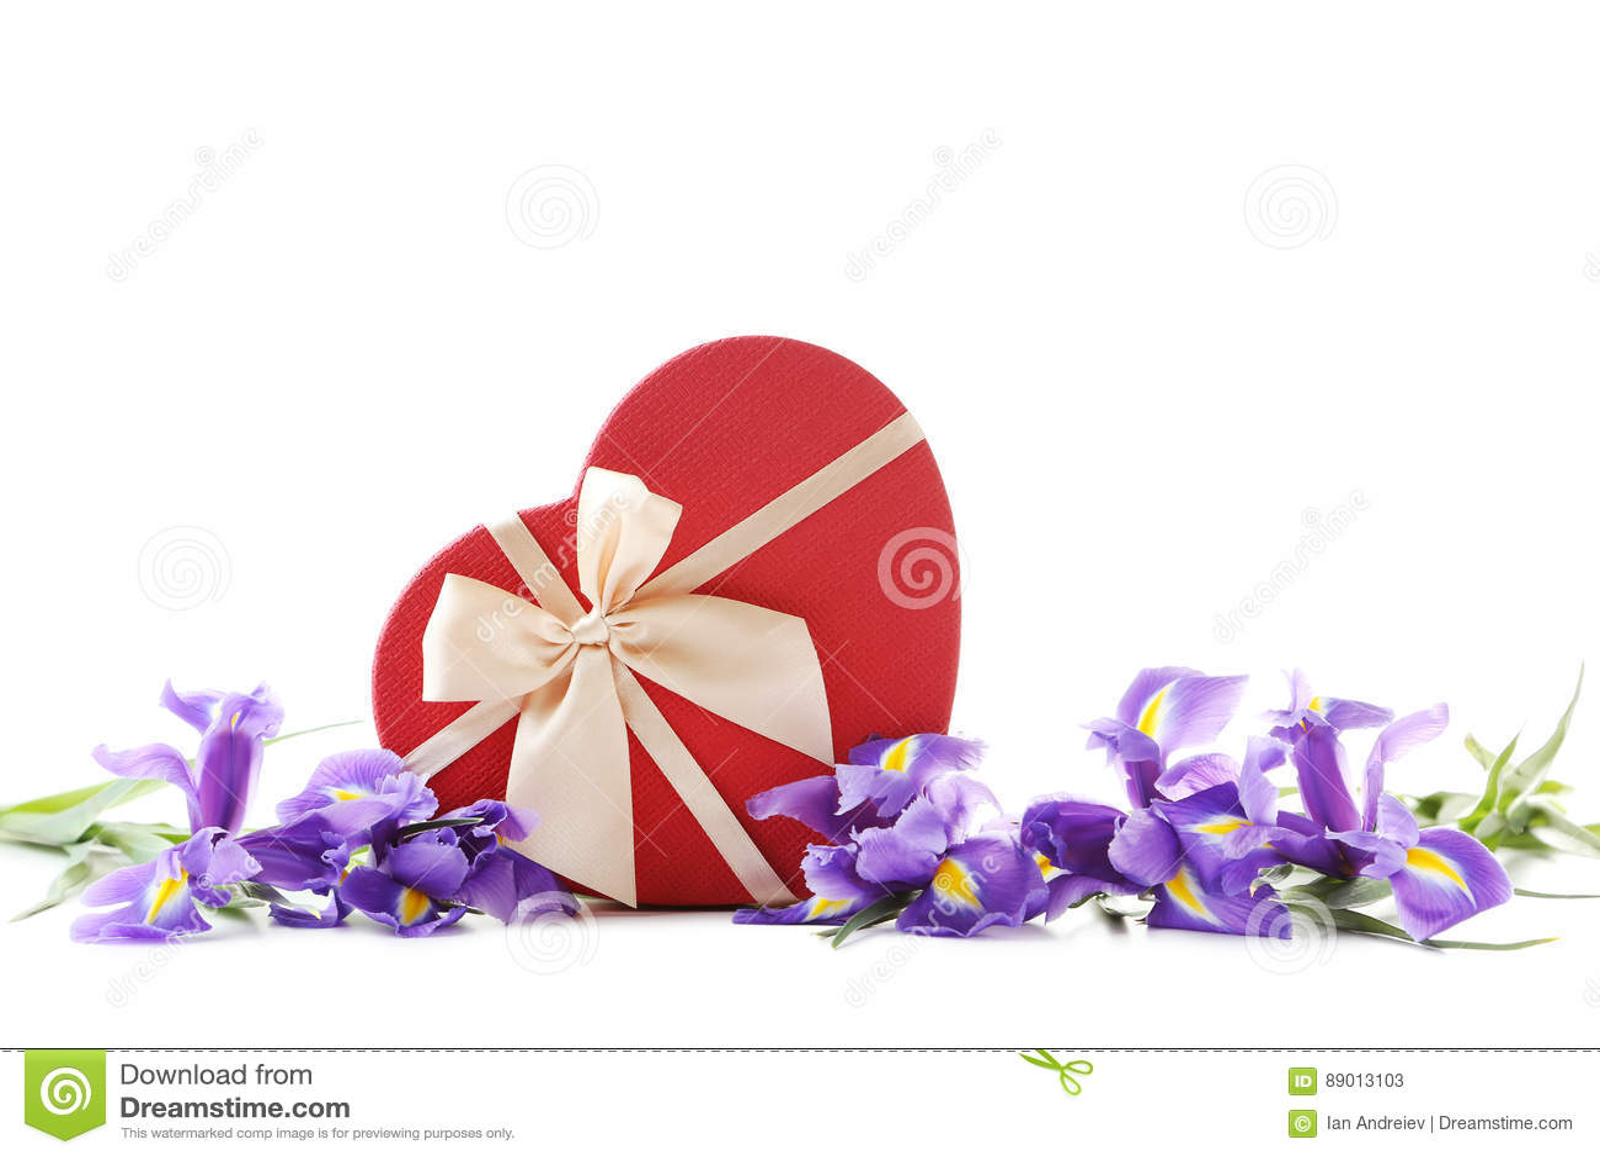 Bouquet of iris flowers stock image. Image of love, flowers - 89013103